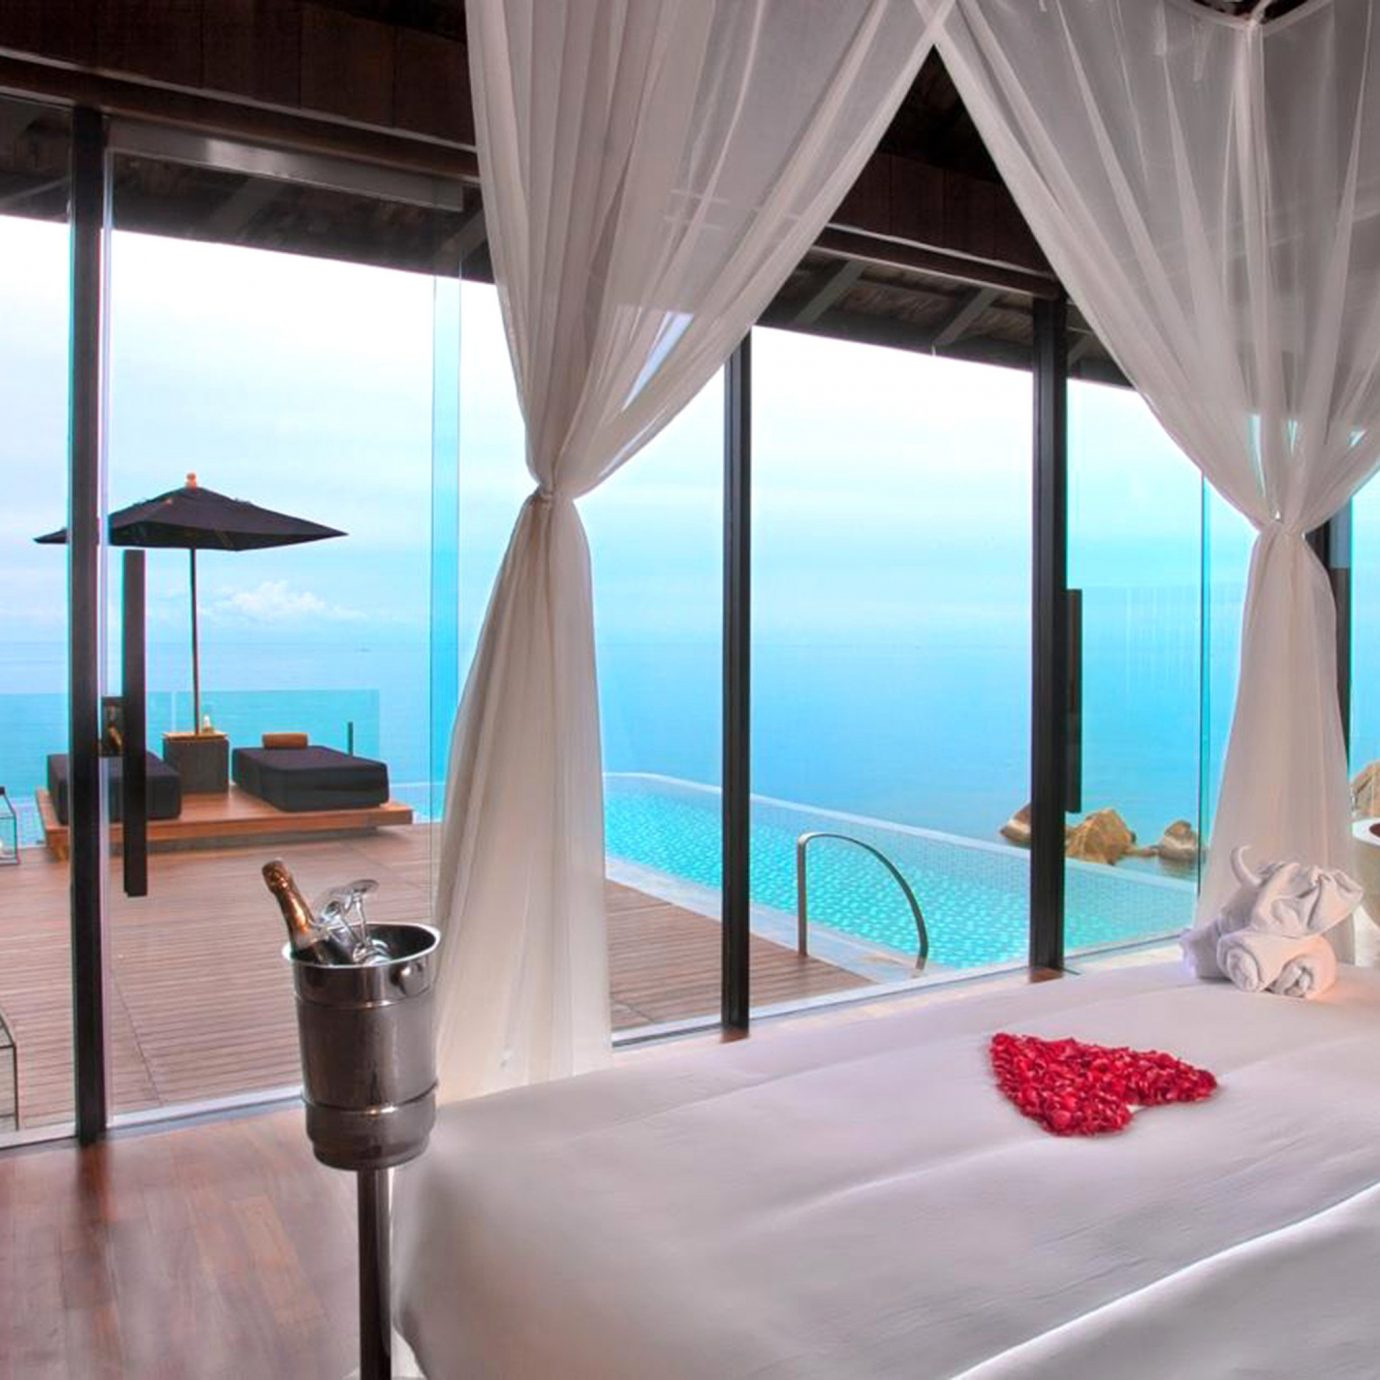 Balcony Beachfront Bedroom Honeymoon Patio Pool Romantic Scenic views Suite Tropical Villa Waterfront property building Resort cottage